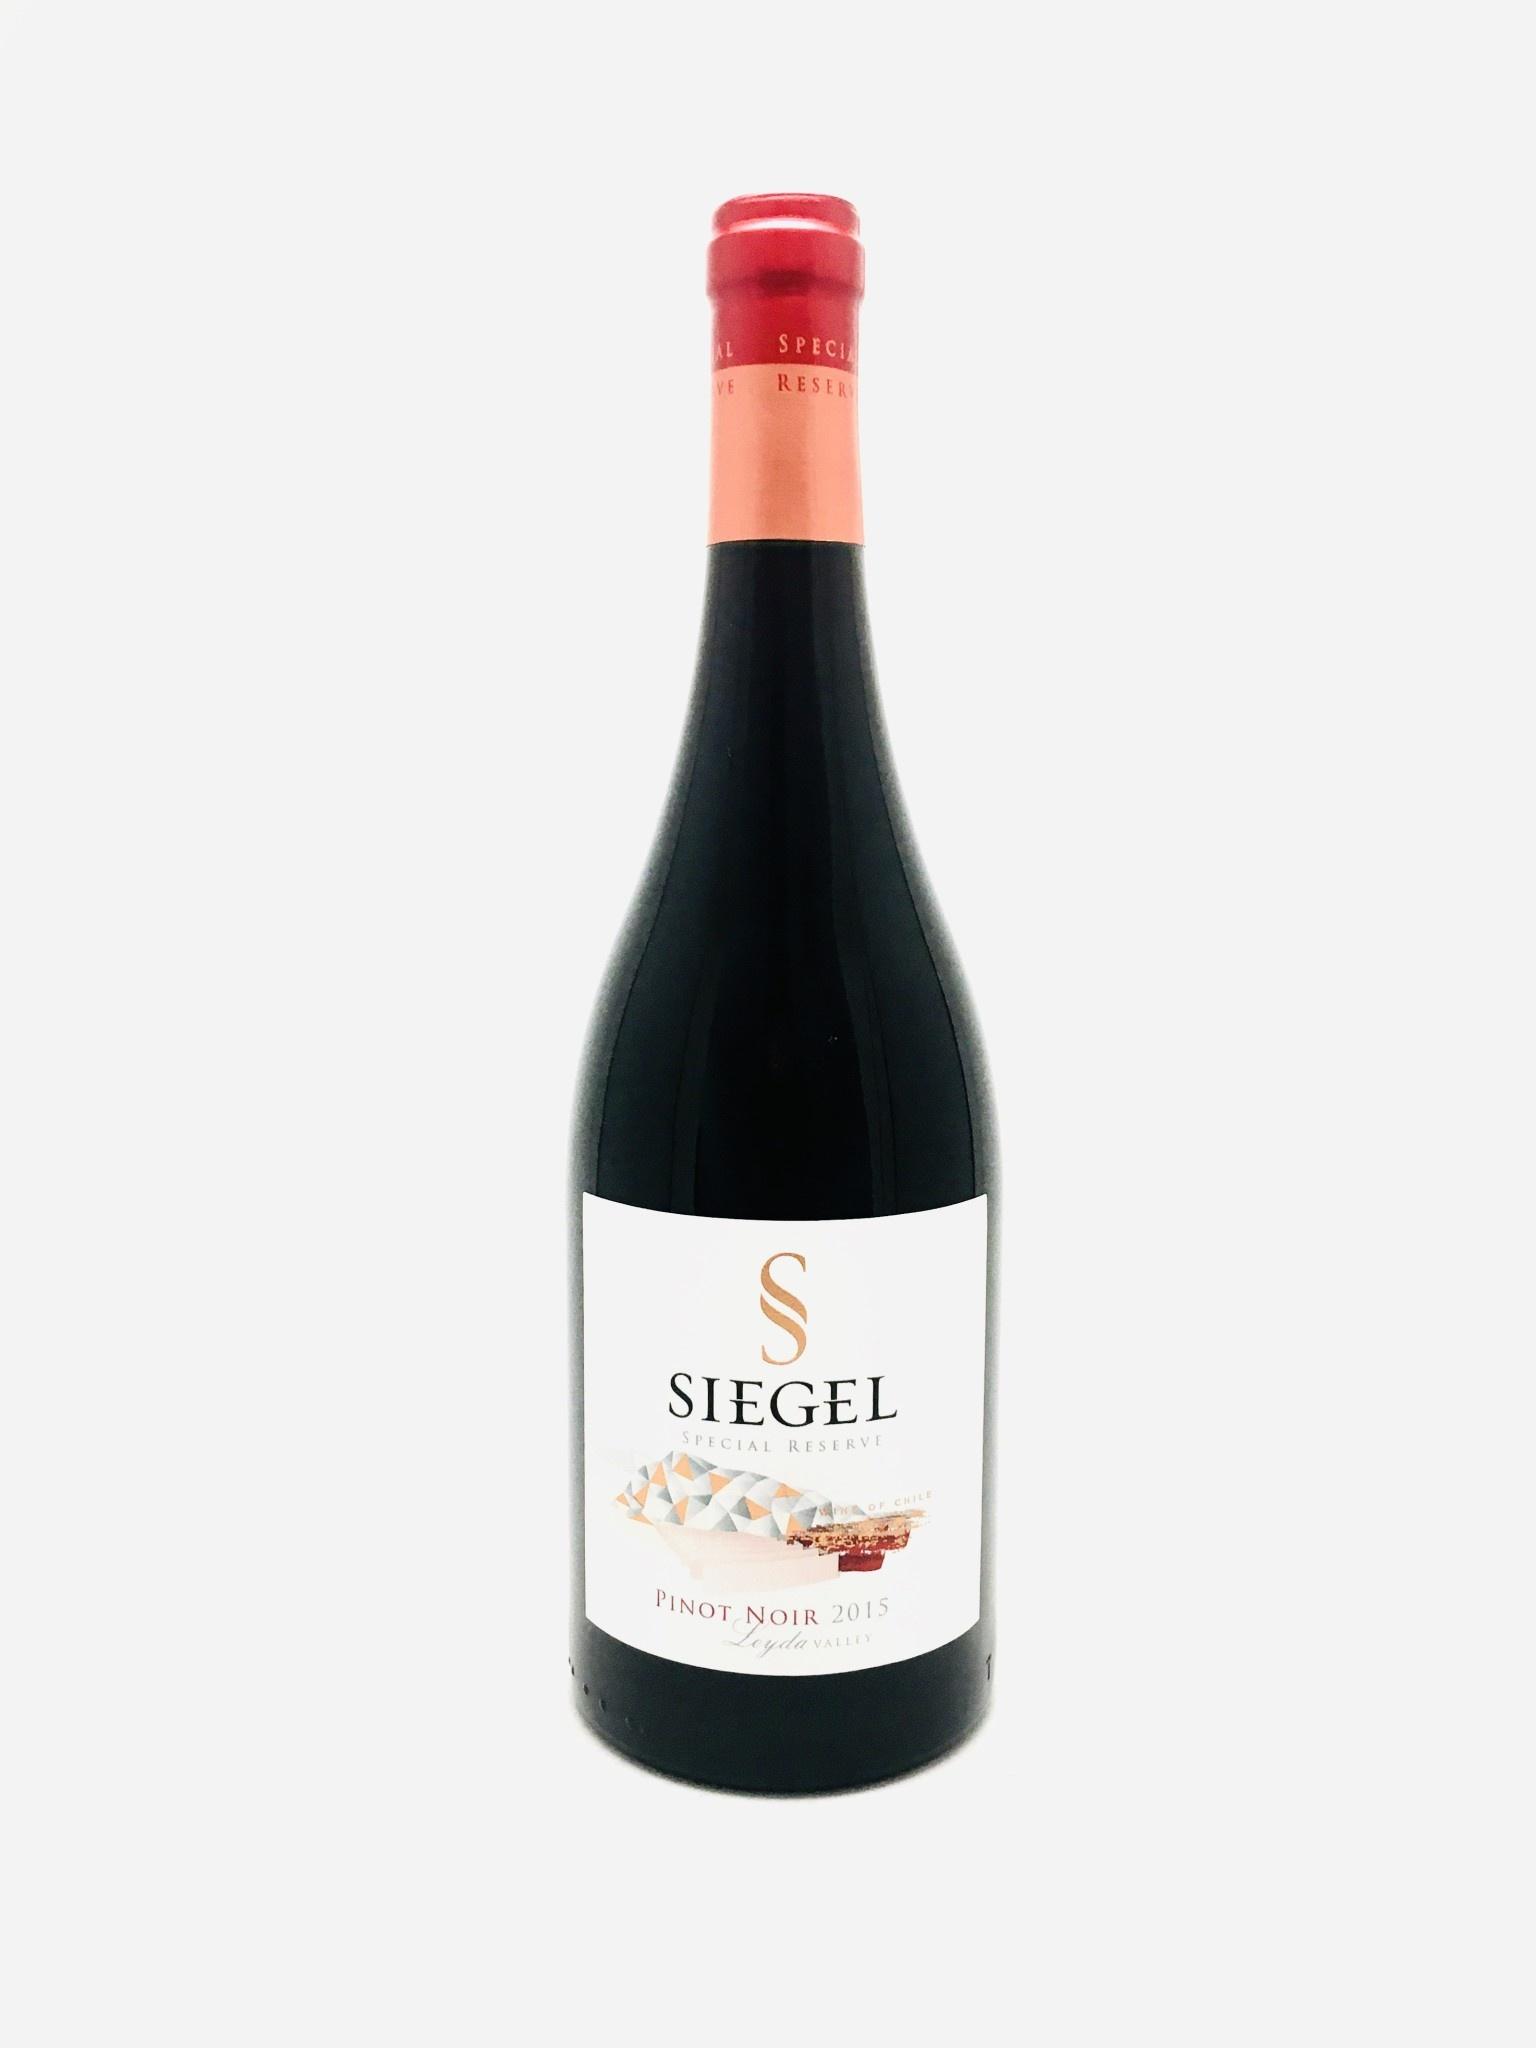 Viña Siegel Special Reserve Pinot Noir Leyda Valley Chile 2015